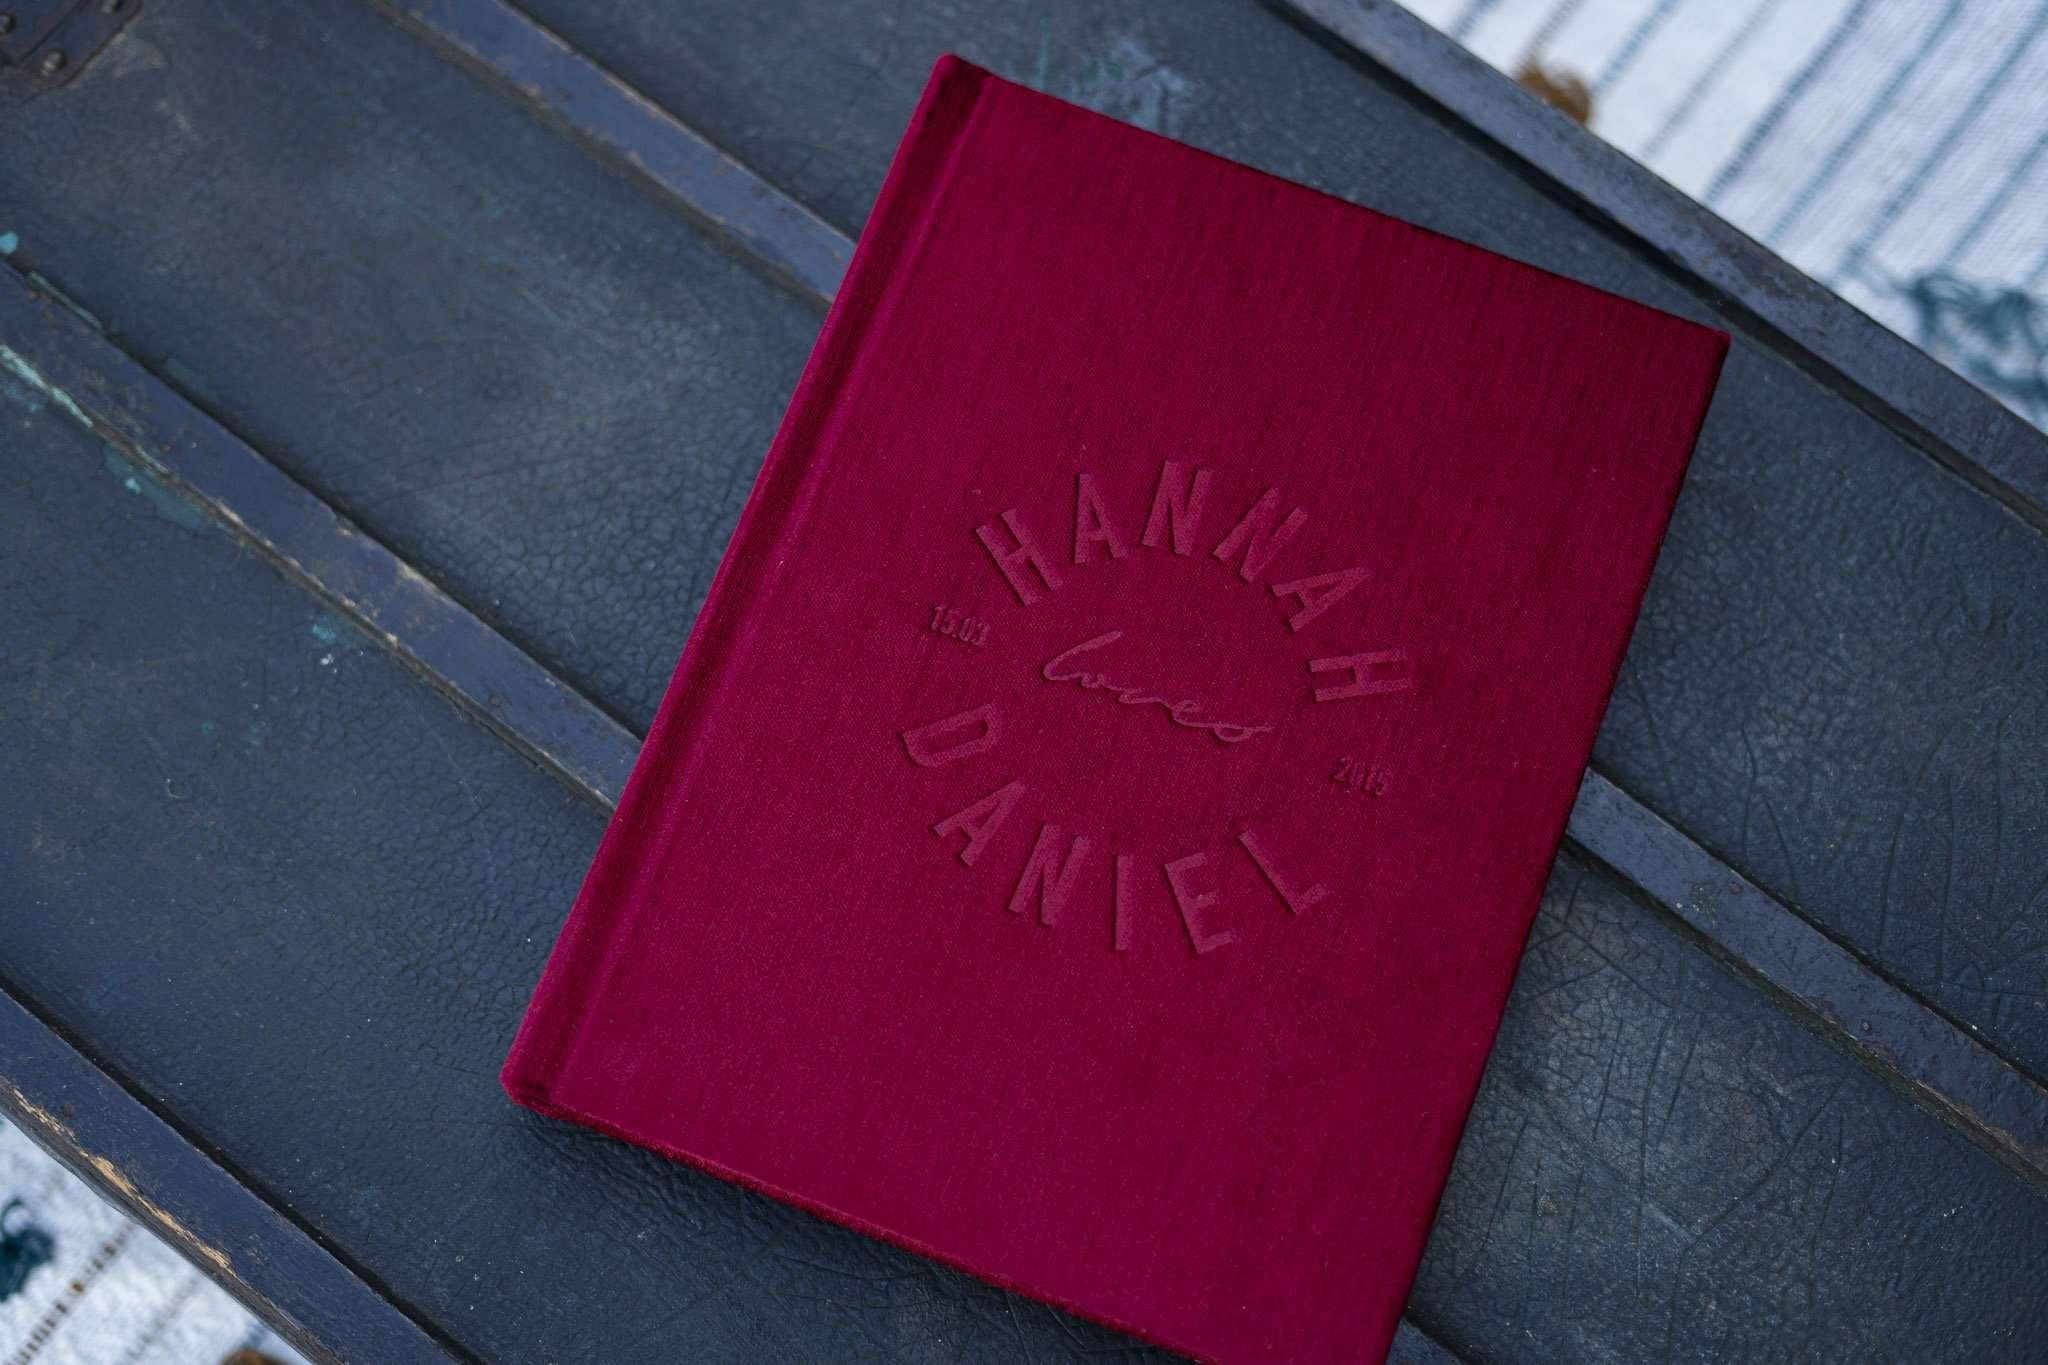 Velvet Wedding Album by The Coffee Table Book Photo Albums & Books